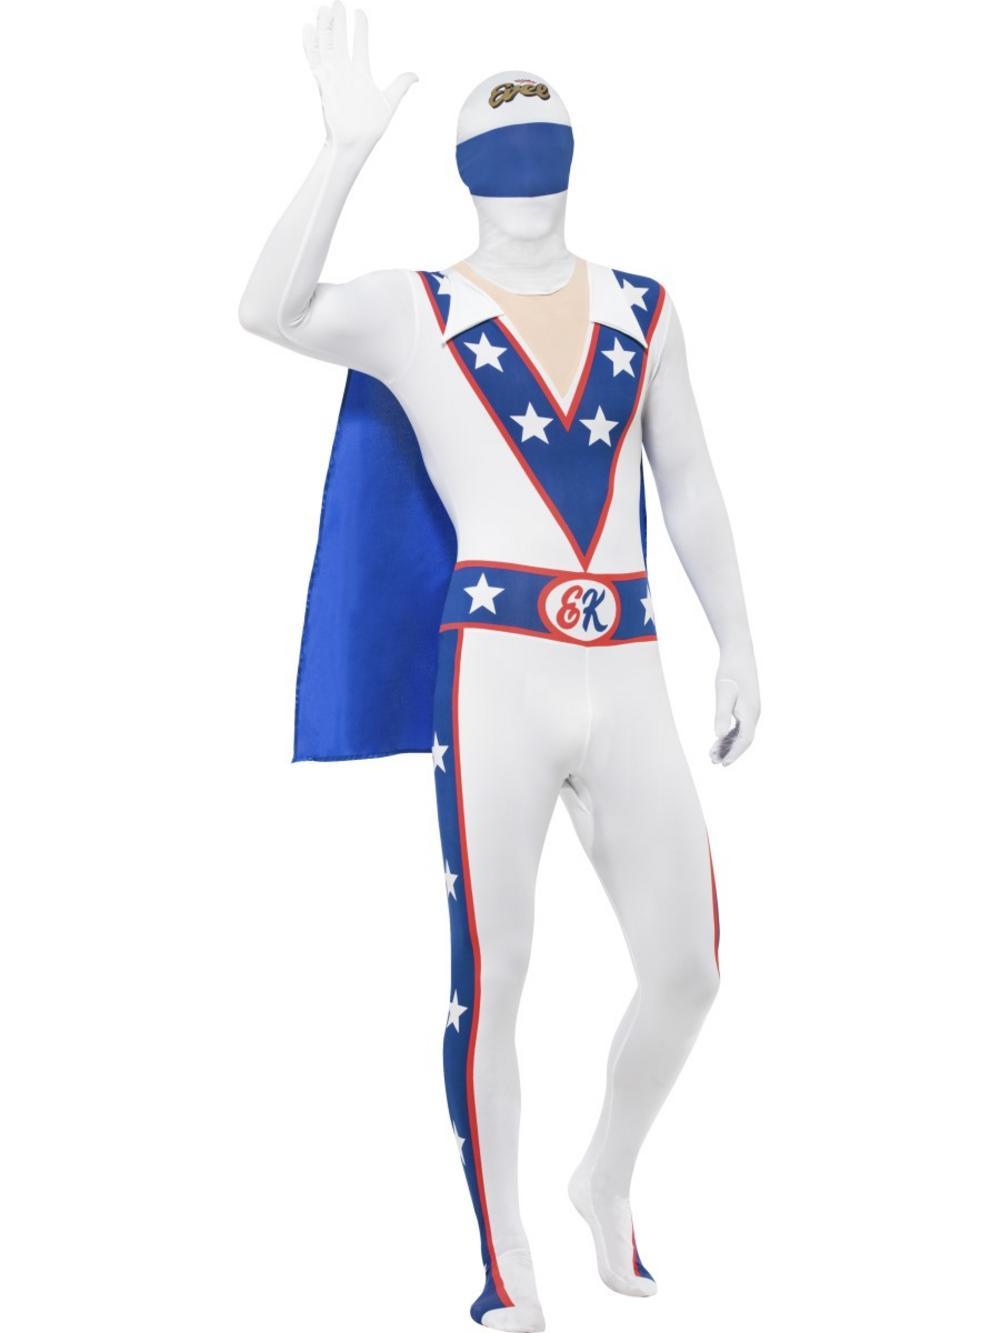 Evel Knievel Second Skin Costume